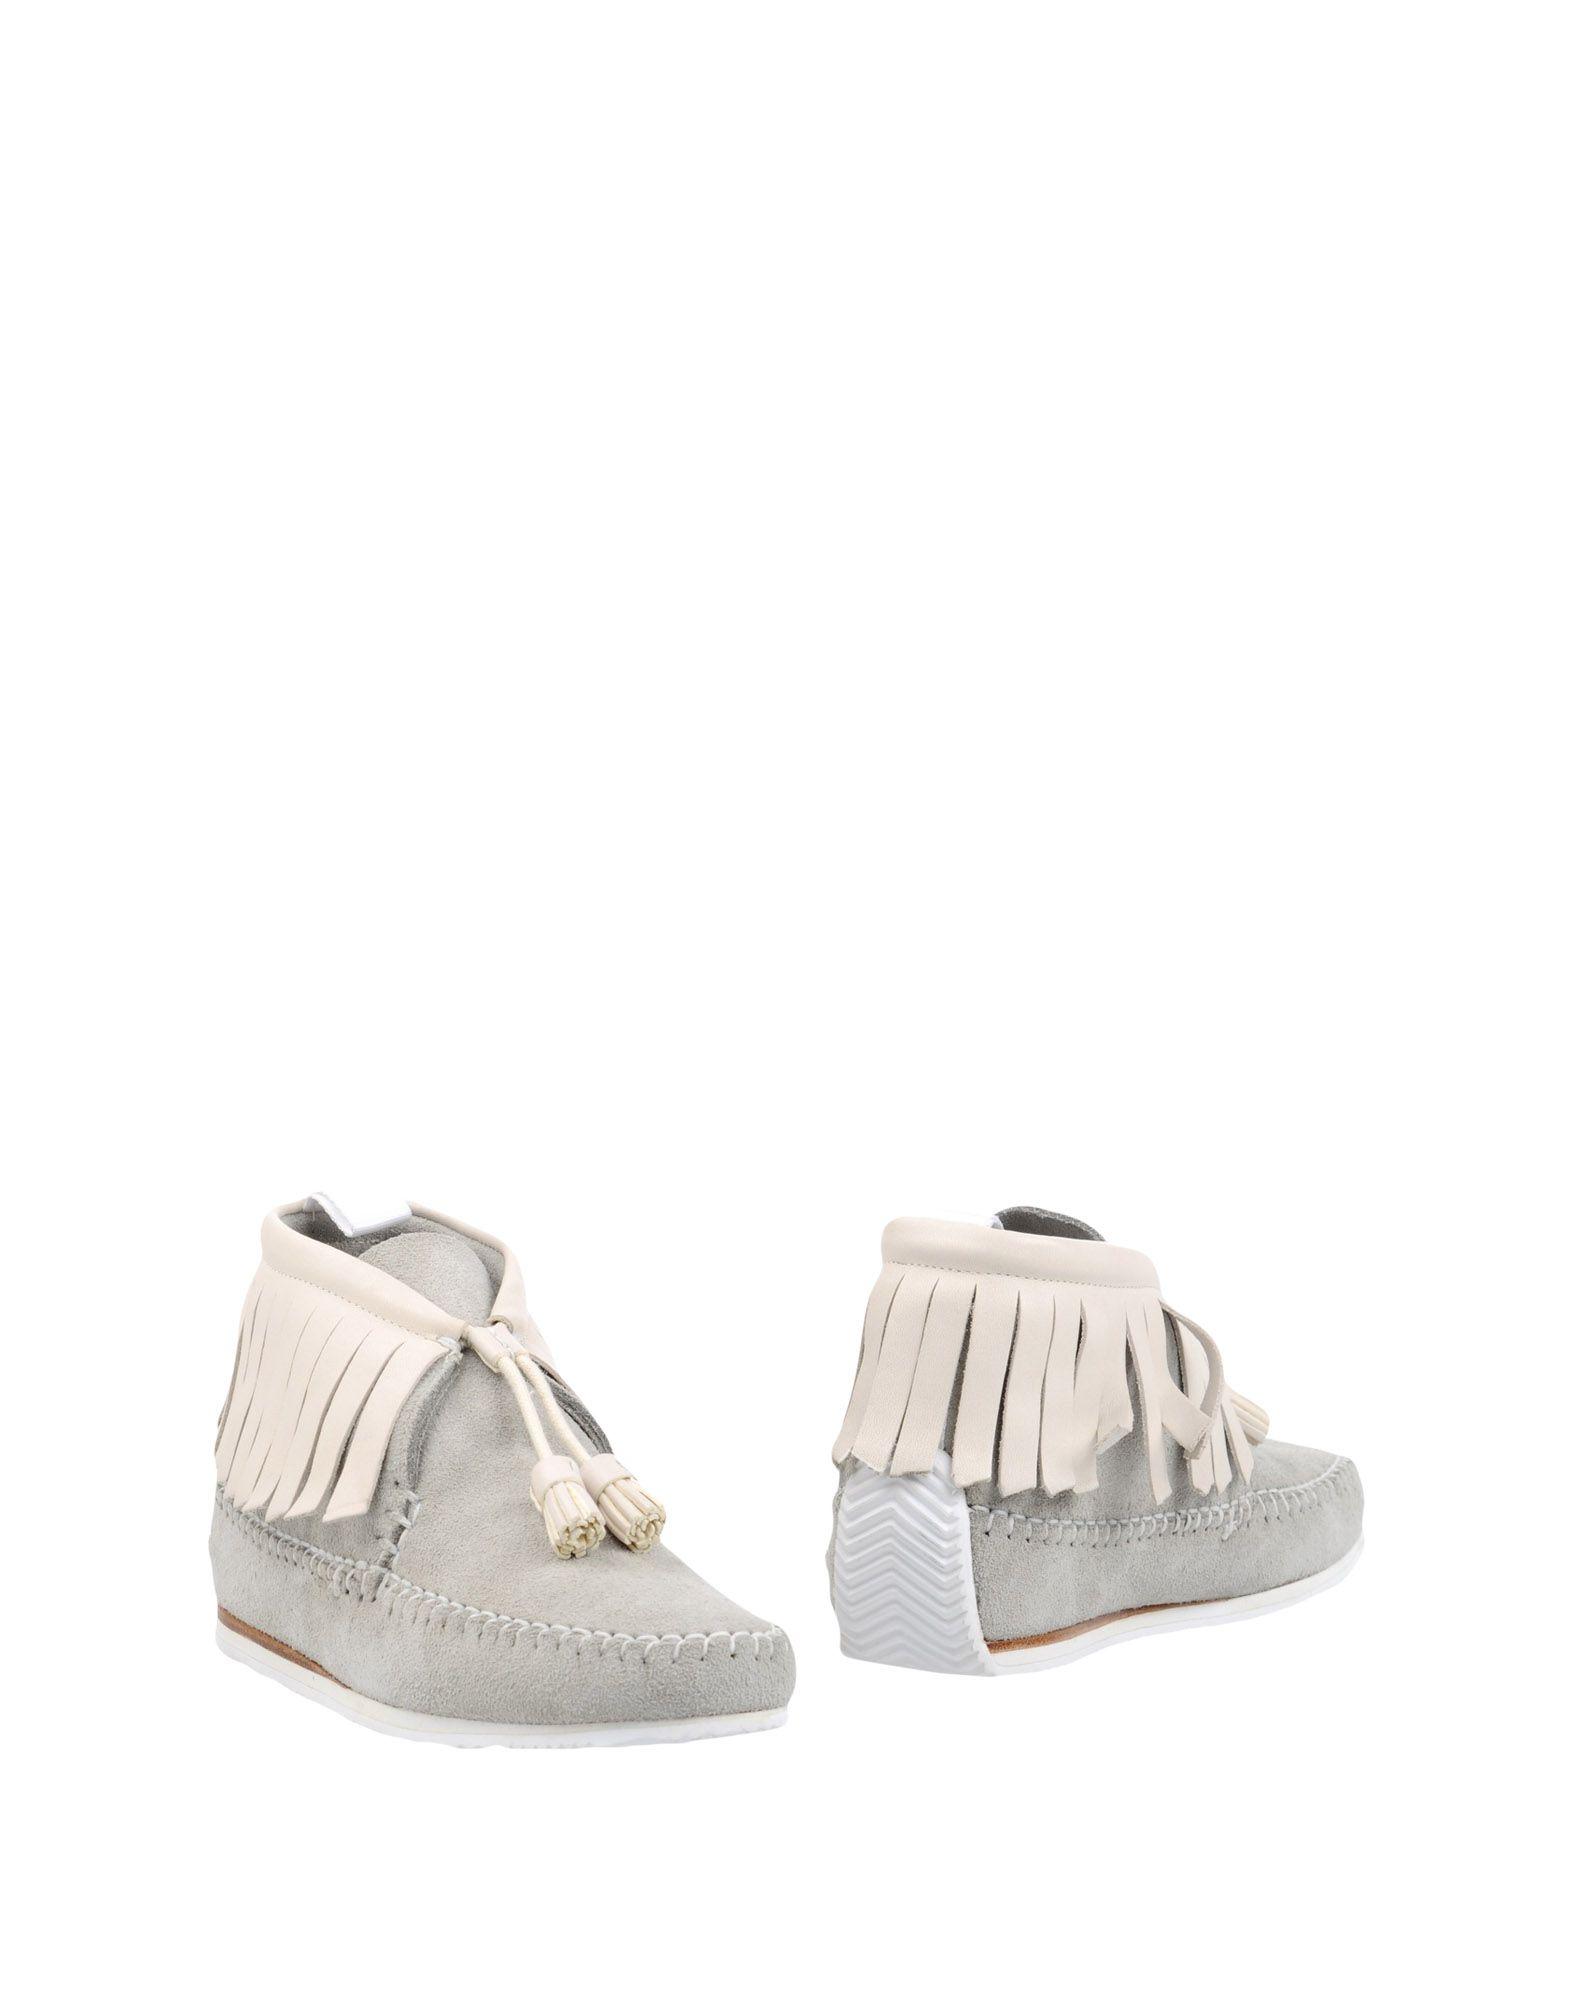 Rag & Bone Damen Stiefelette Damen Bone  11247089VJ Neue Schuhe 139044